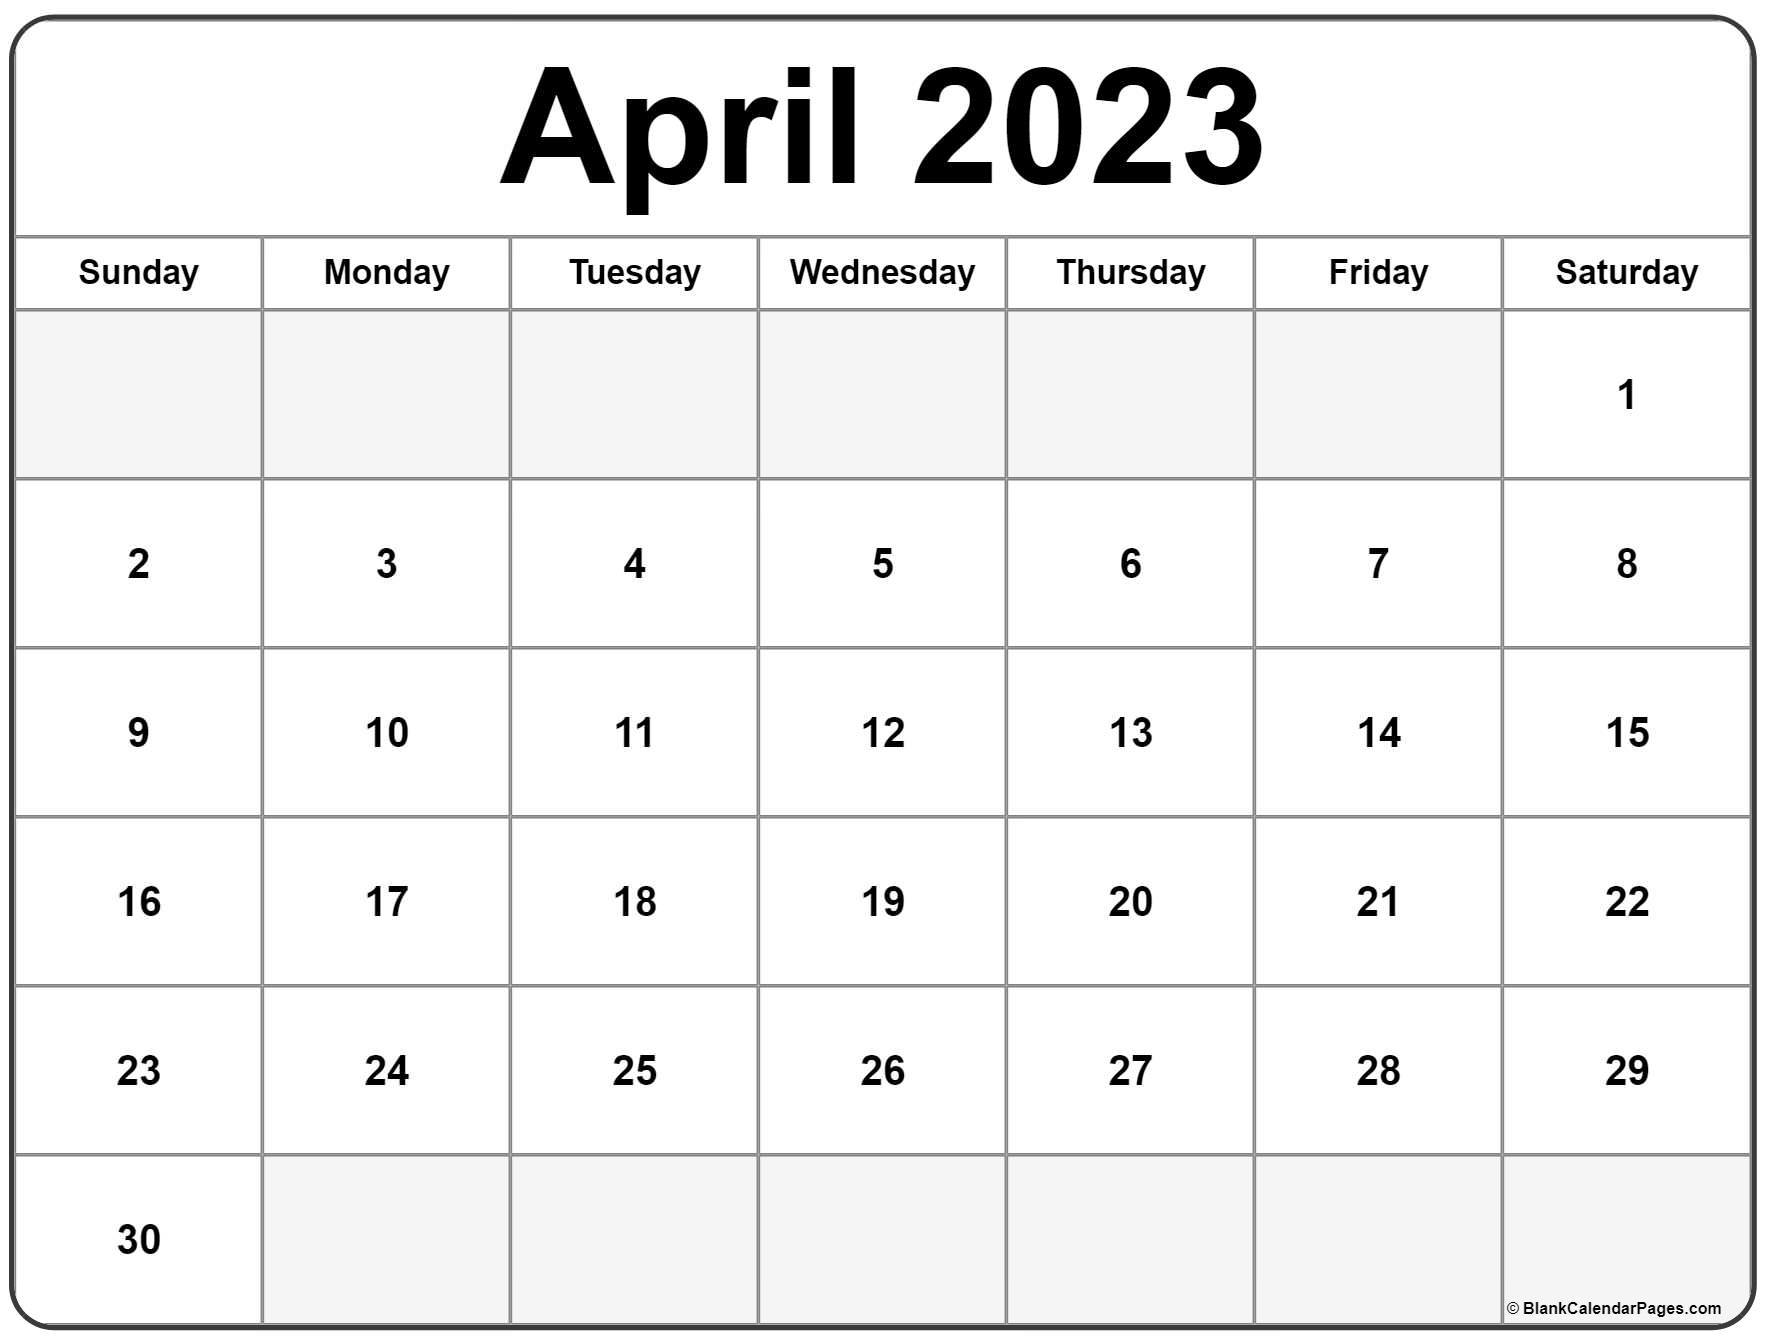 April 2022 calendar | free printable monthly calendars